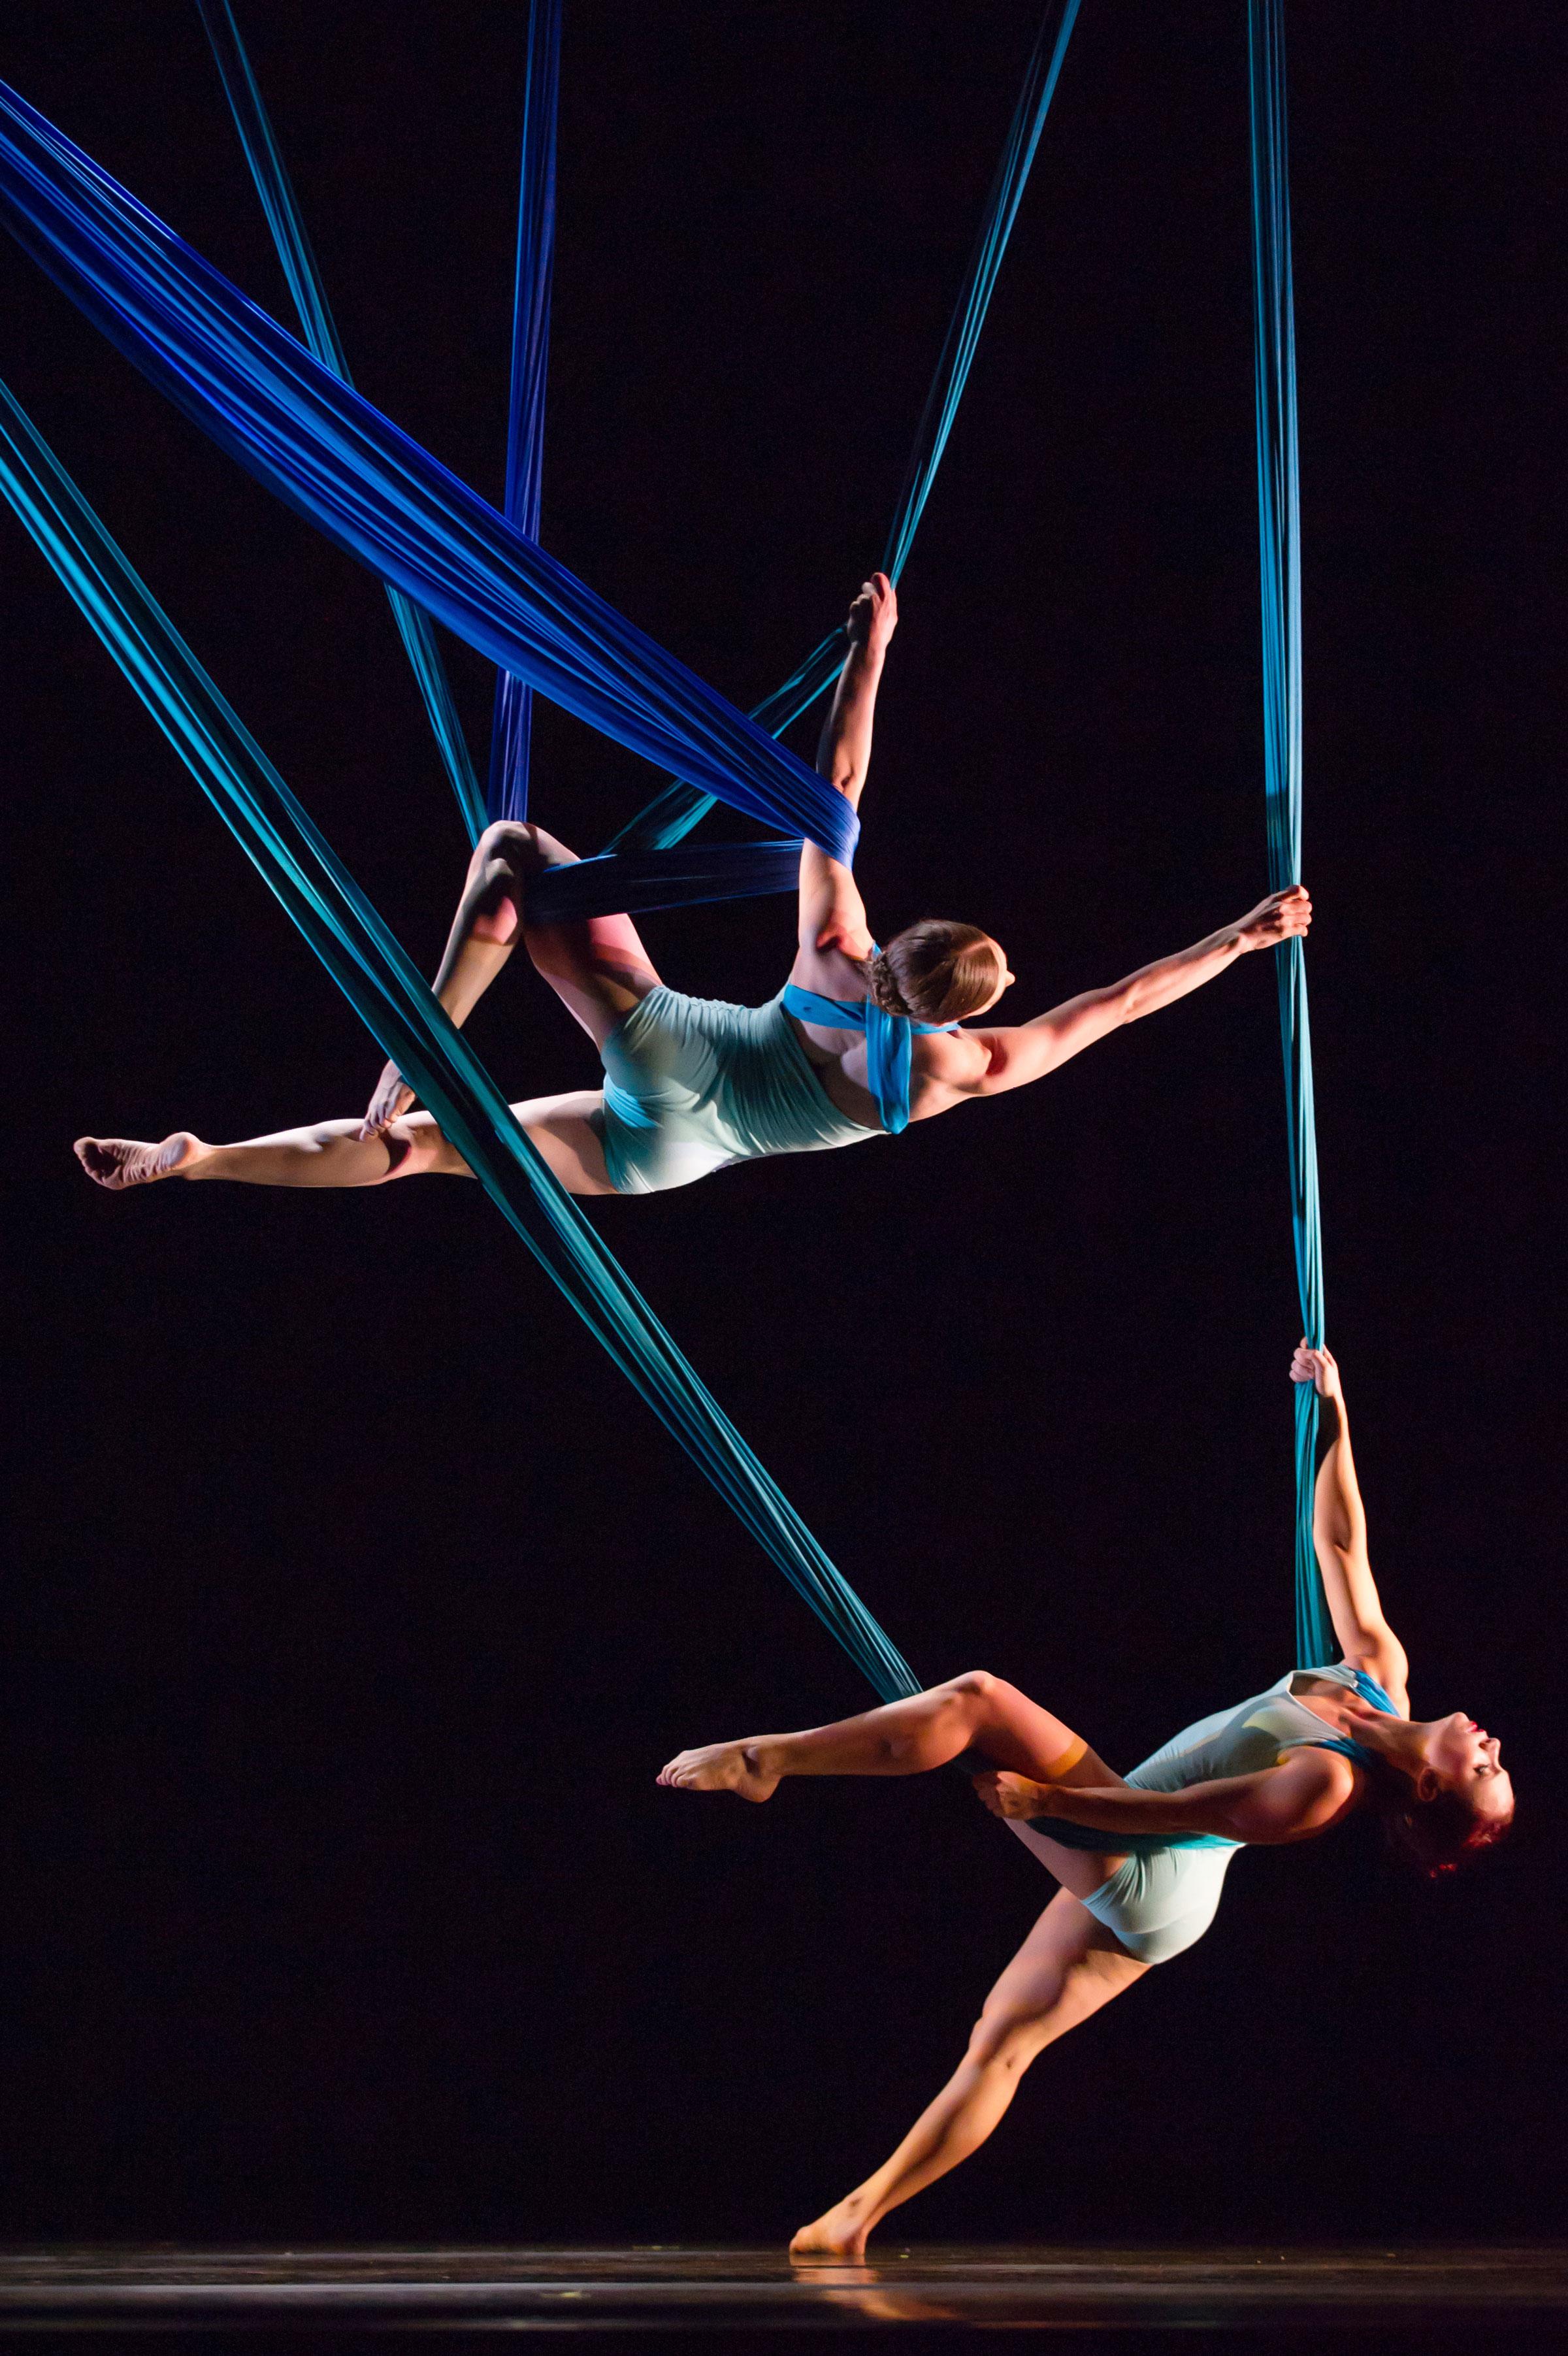 Aerial Dance Chicago performs at GVSU Fall Arts Celebration.